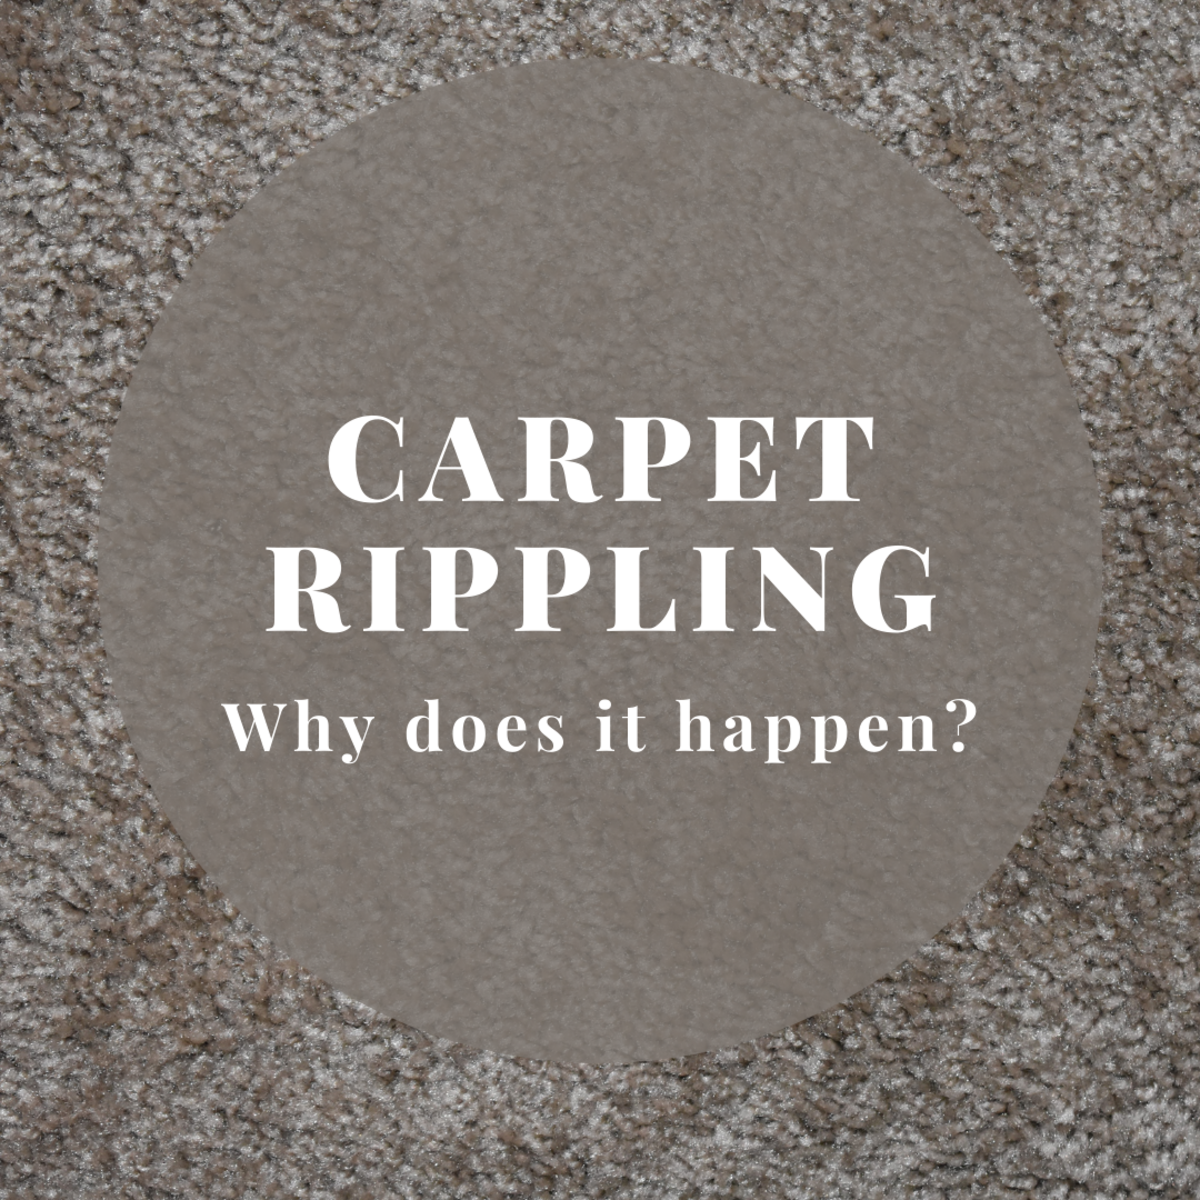 what-causes-carpet-rippling